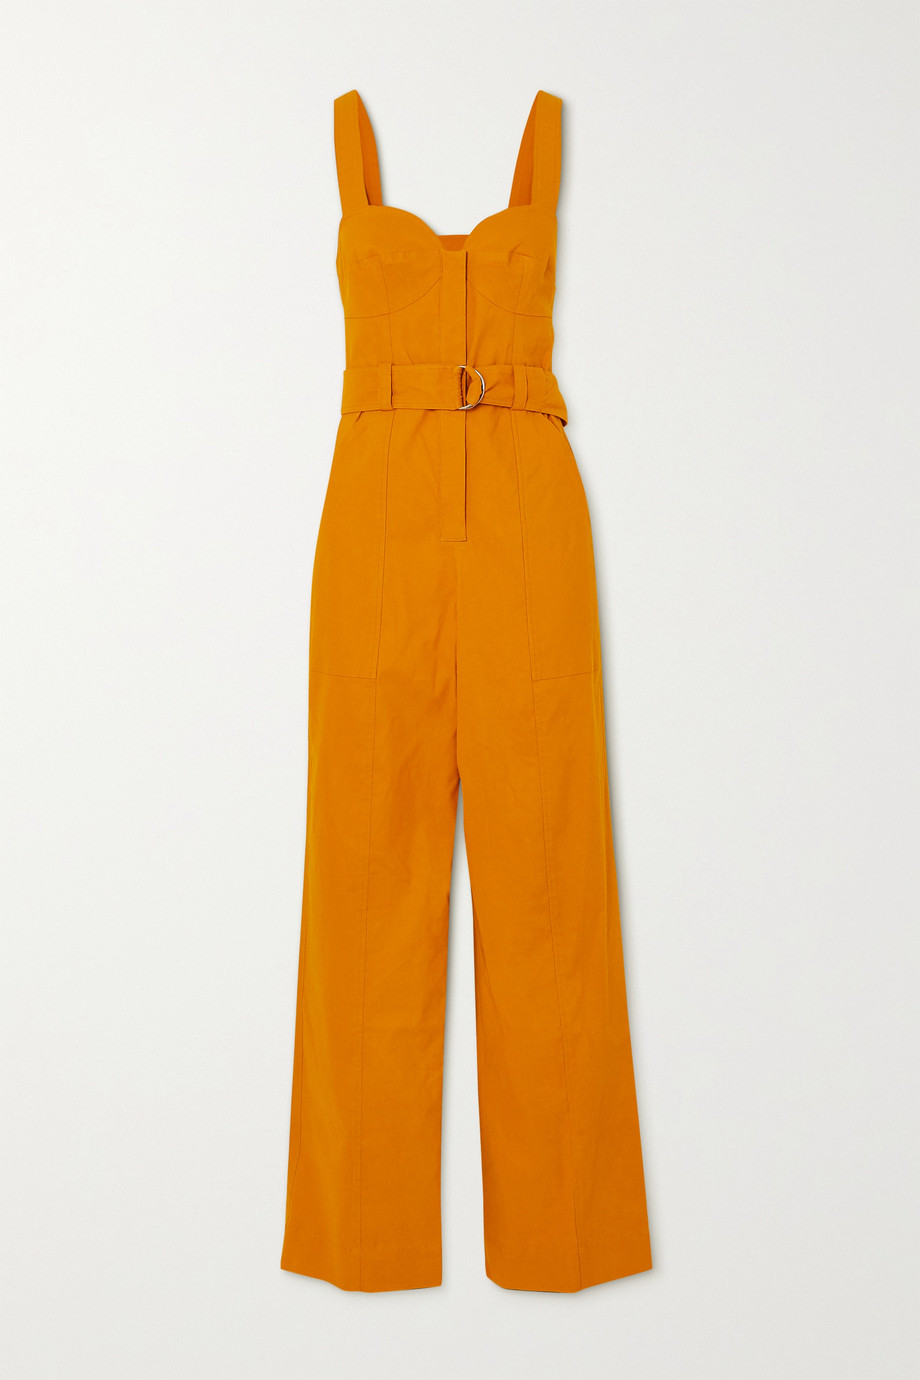 A.L.C. A.L.C. x Petra Flannery Cyprus belted linen-blend jumpsuit